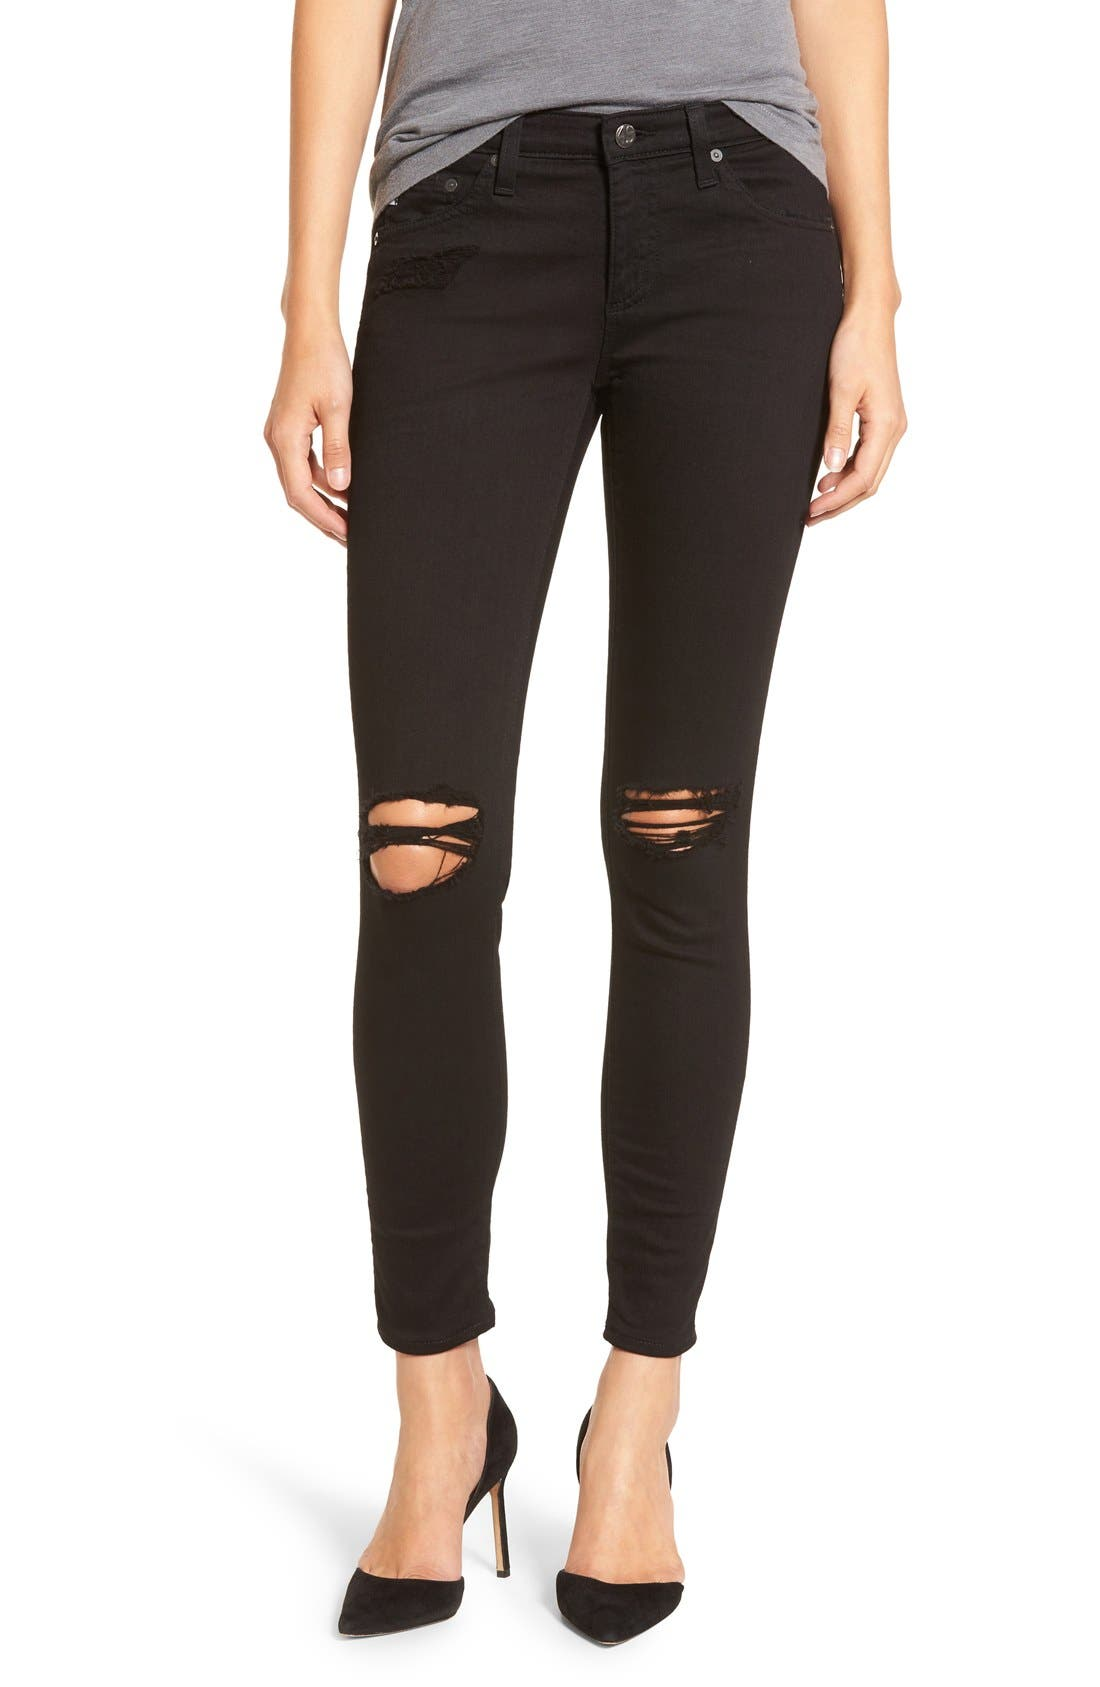 Alternate Image 1 Selected - AG 'The Legging' Ankle Super Skinny Jeans